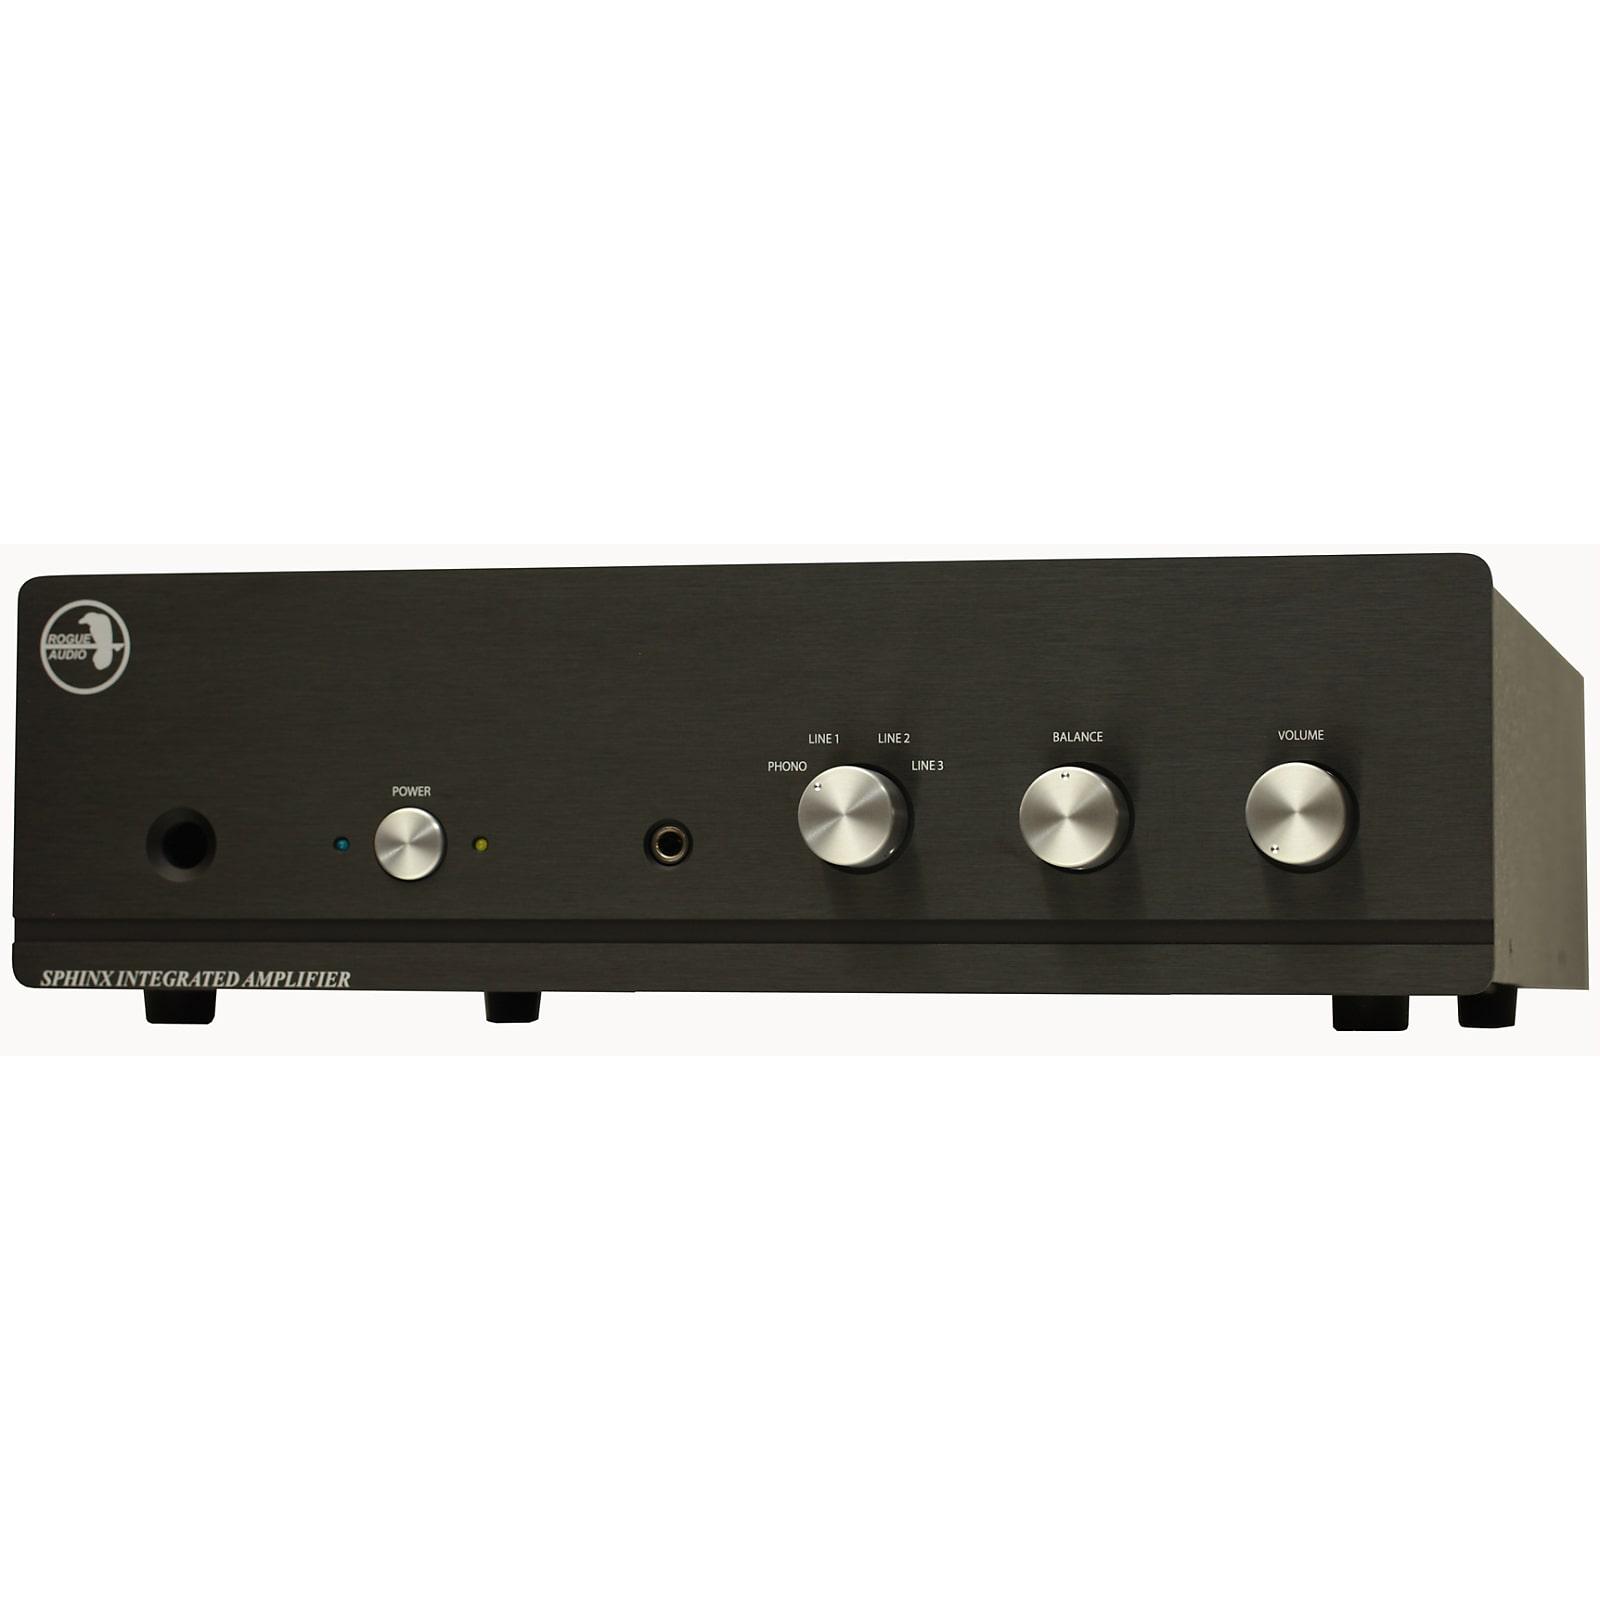 Rogue Audio Sphinx V3 100 Watt Per Channel Integrated Amplifier w/ Remote - Black